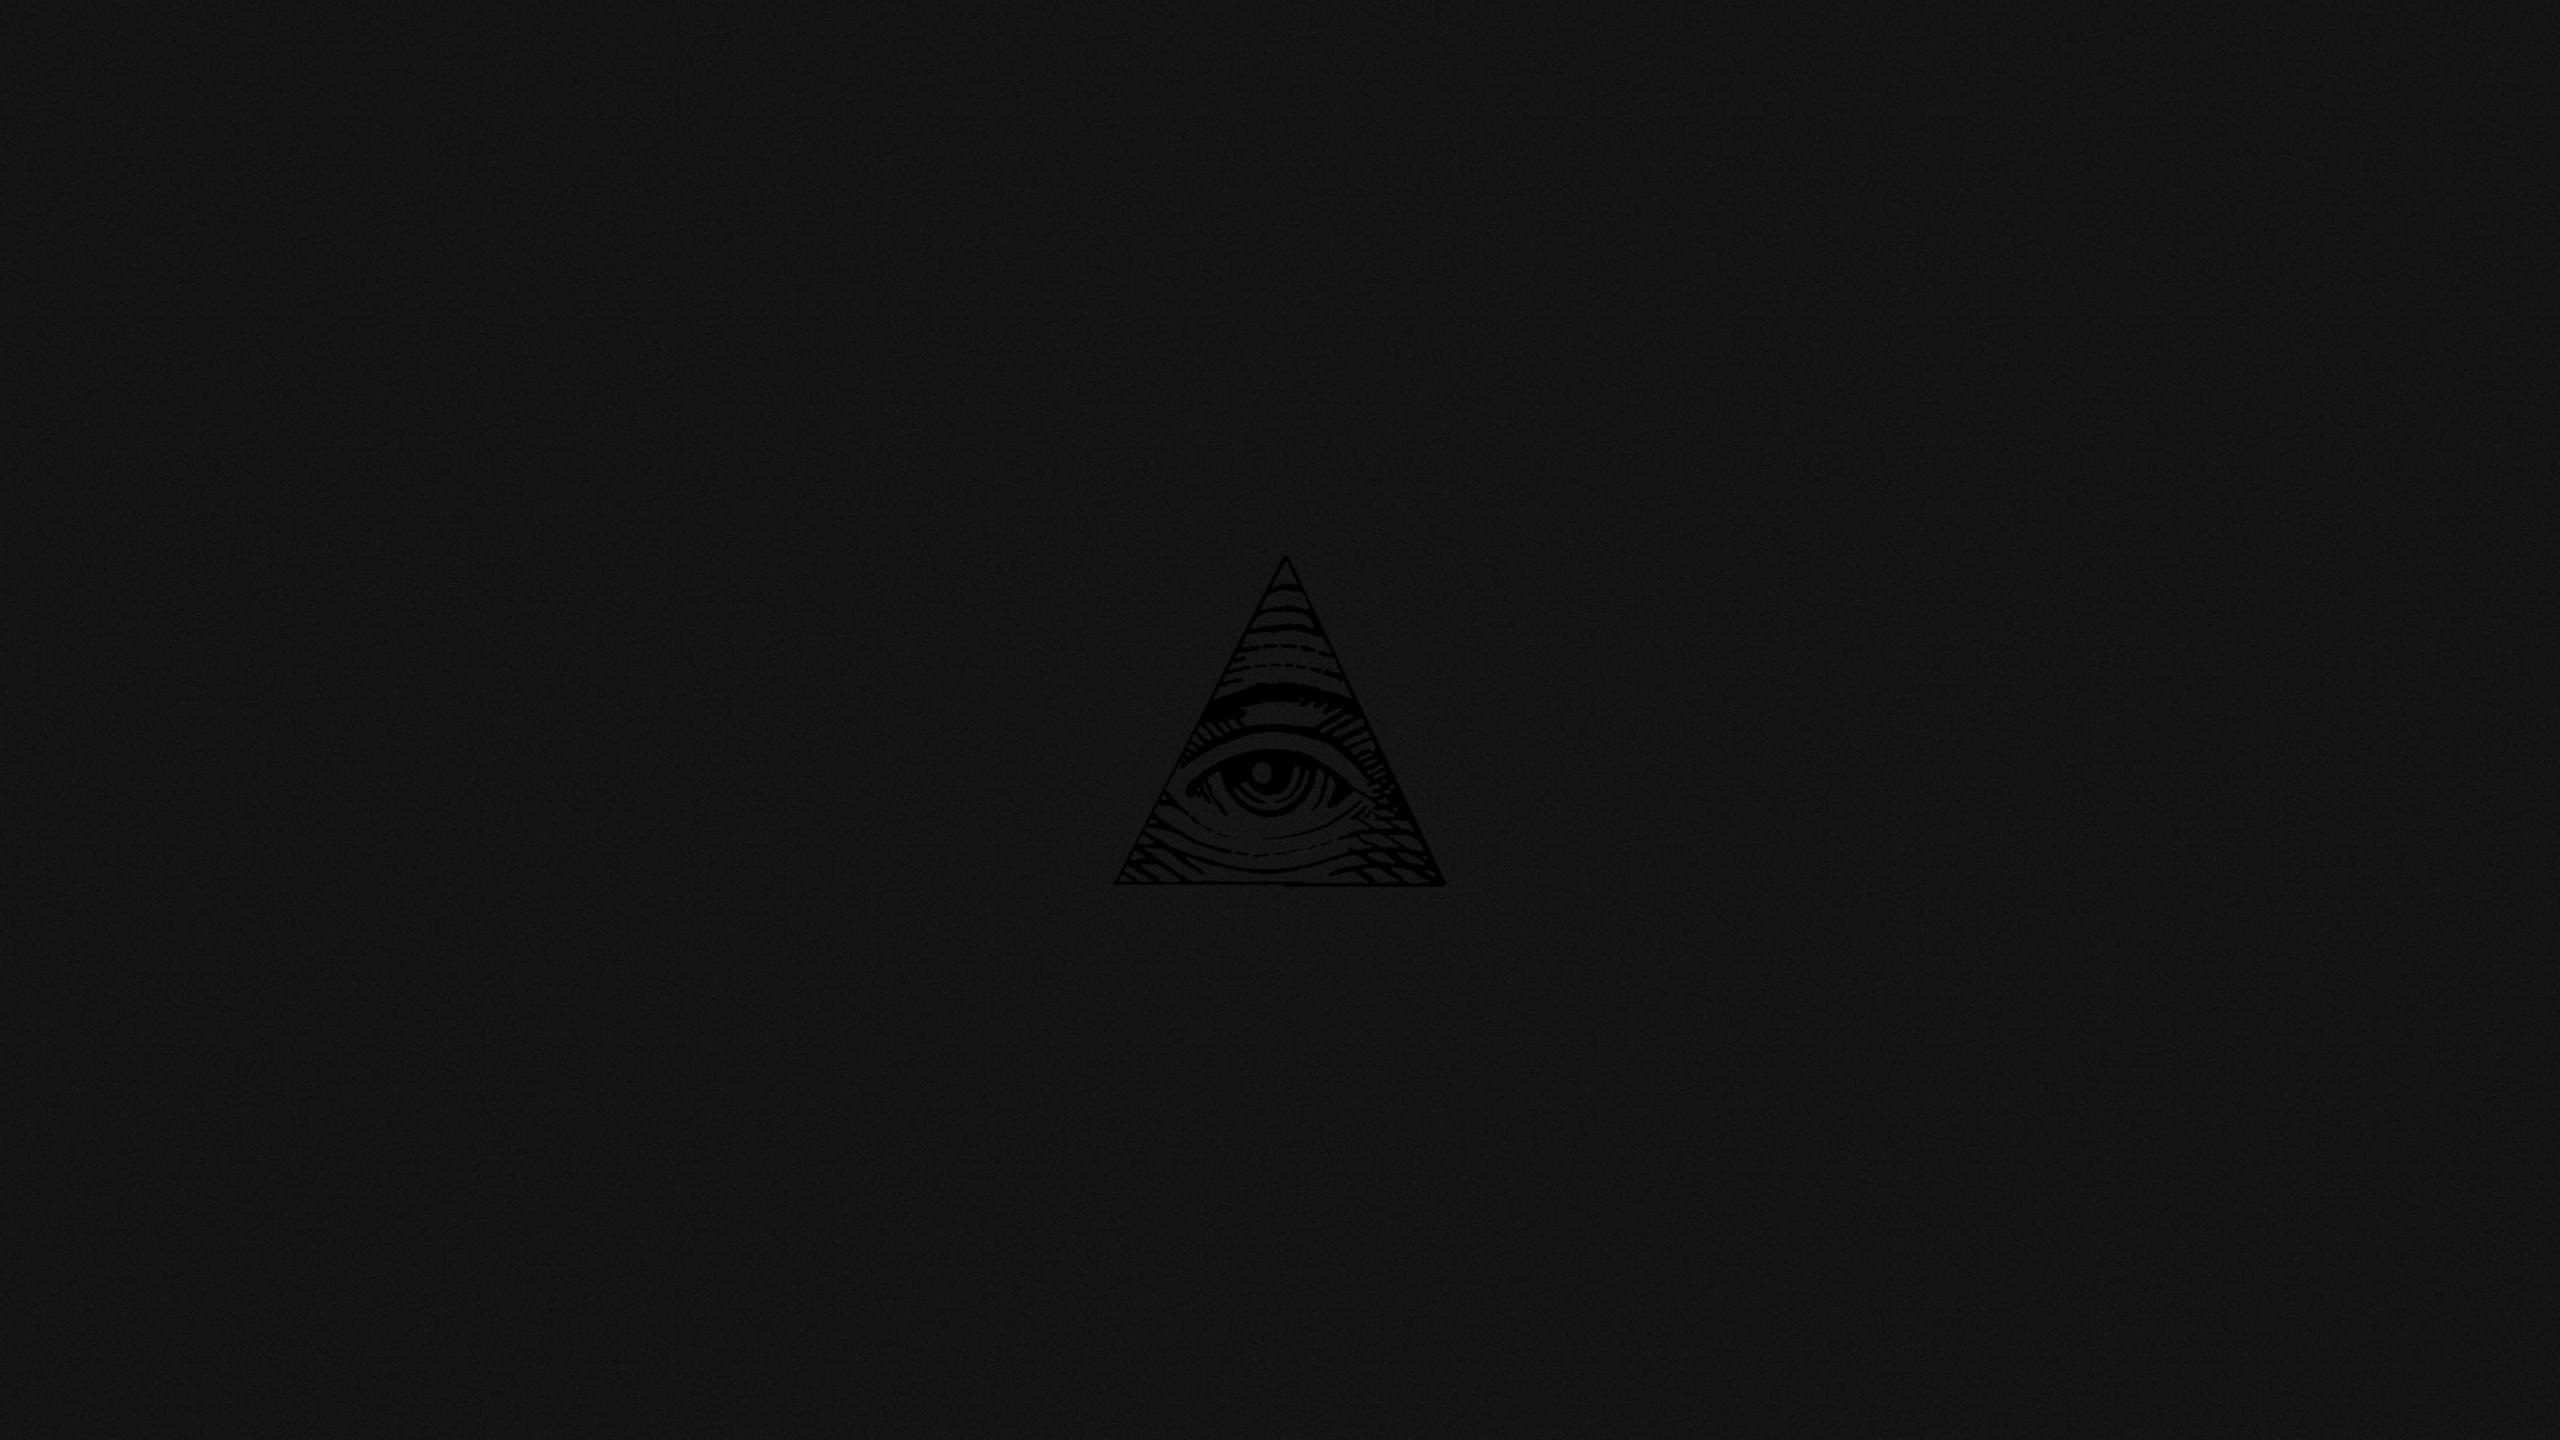 Fine Images Collection: Illuminati Desktop Wallpapers